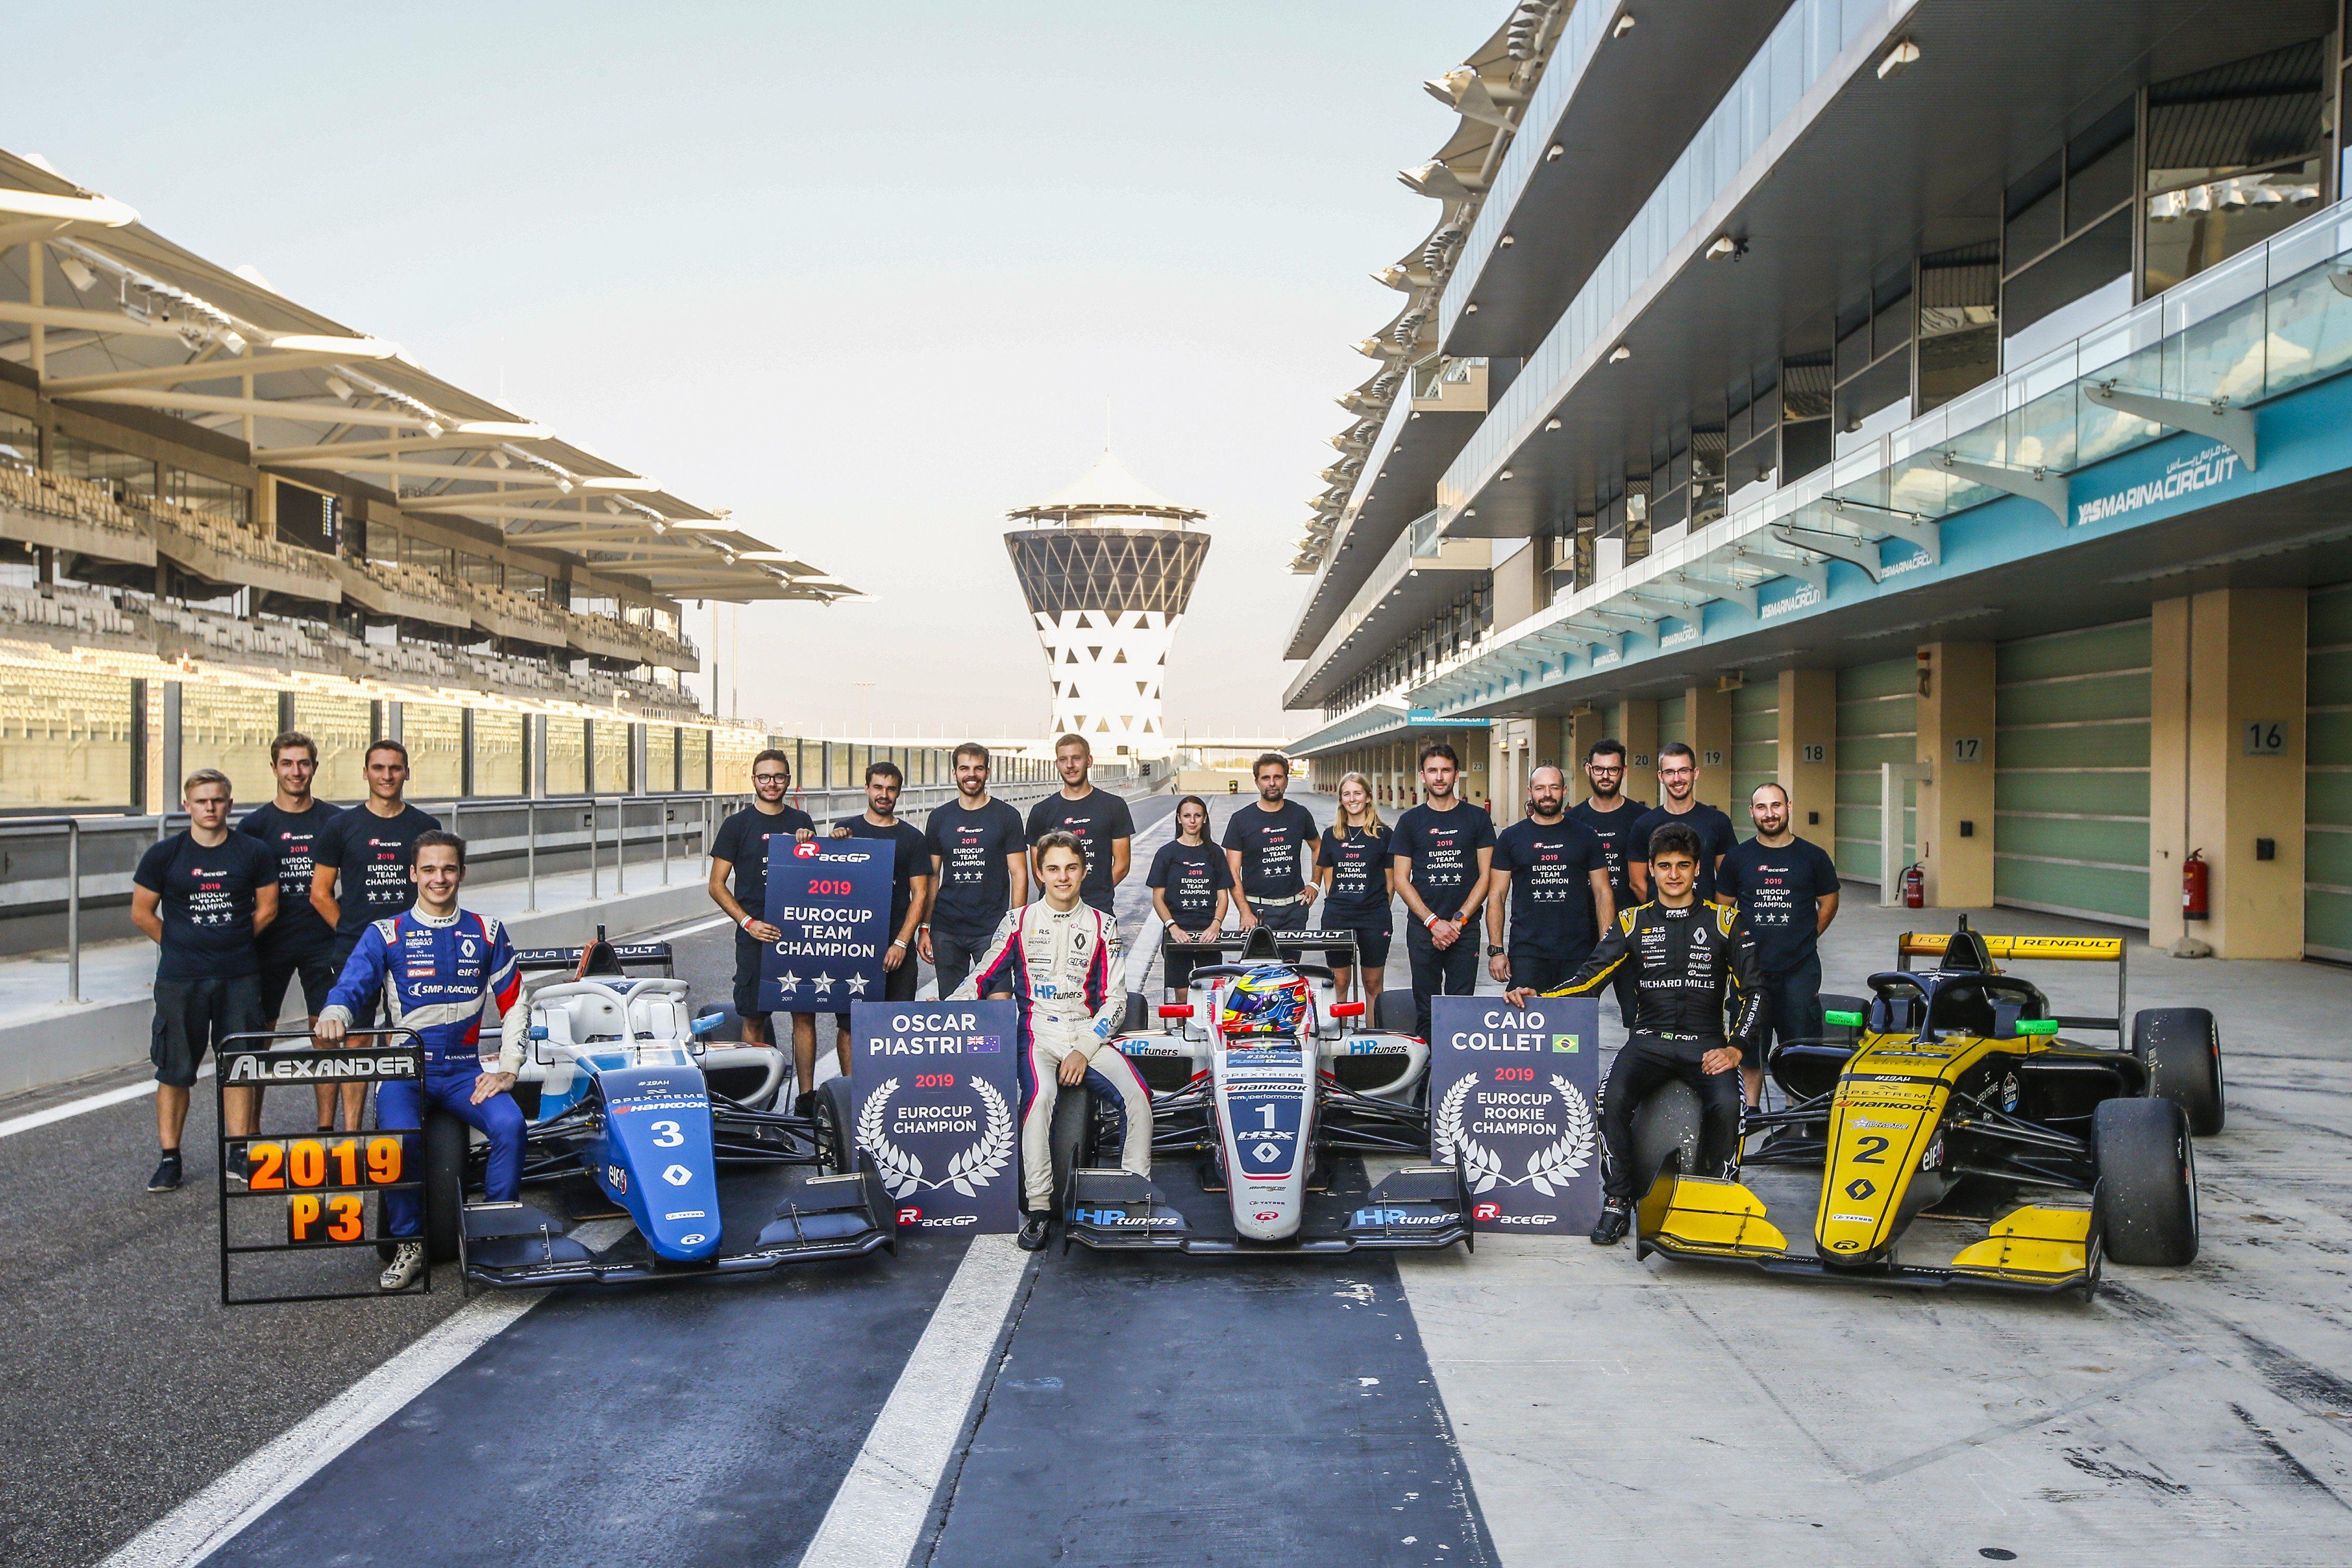 Formule Renault - Abu Dhabi